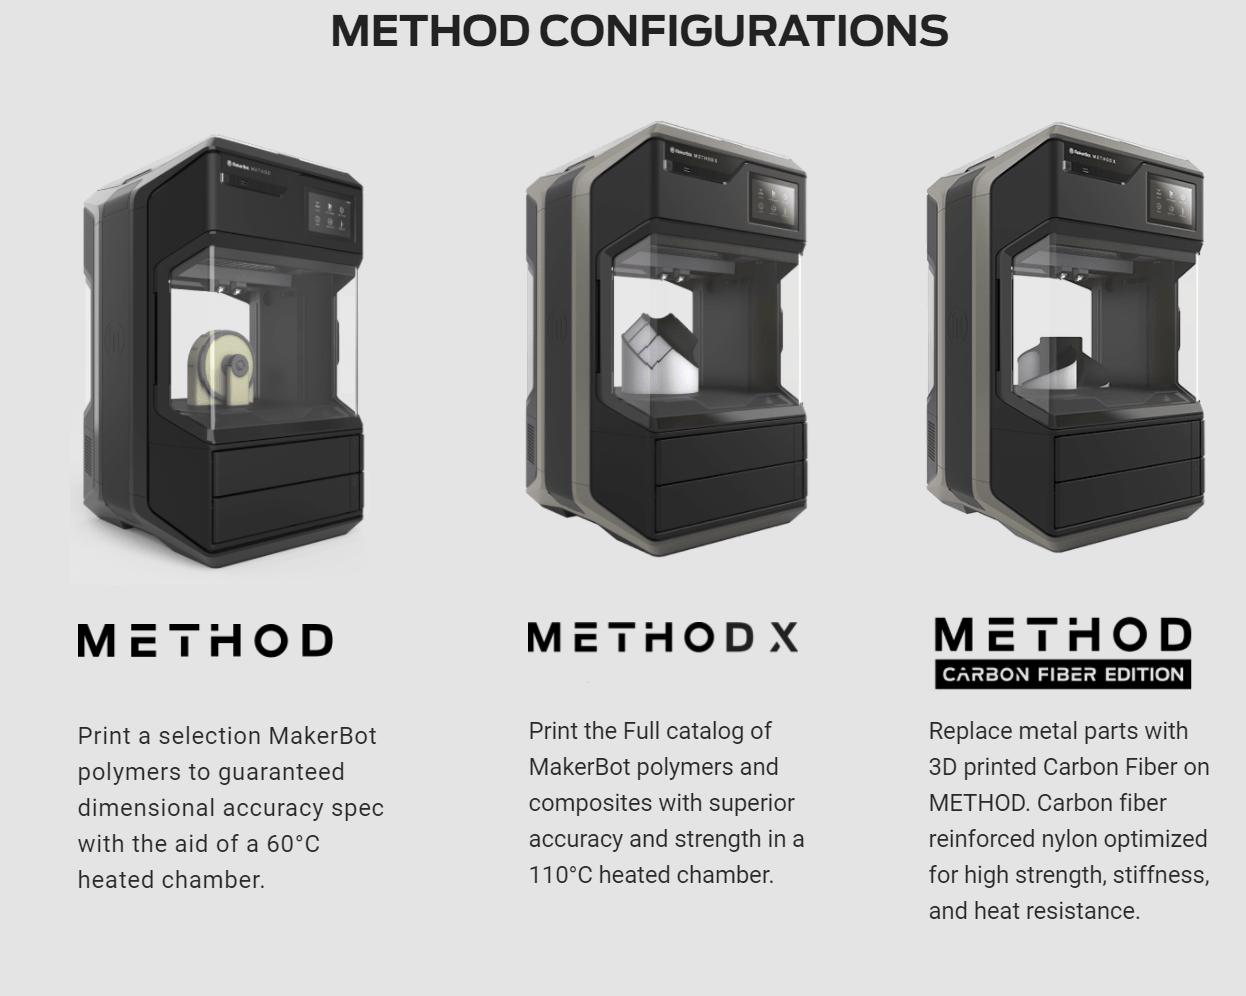 Stratasys MakerBot Method Configuration